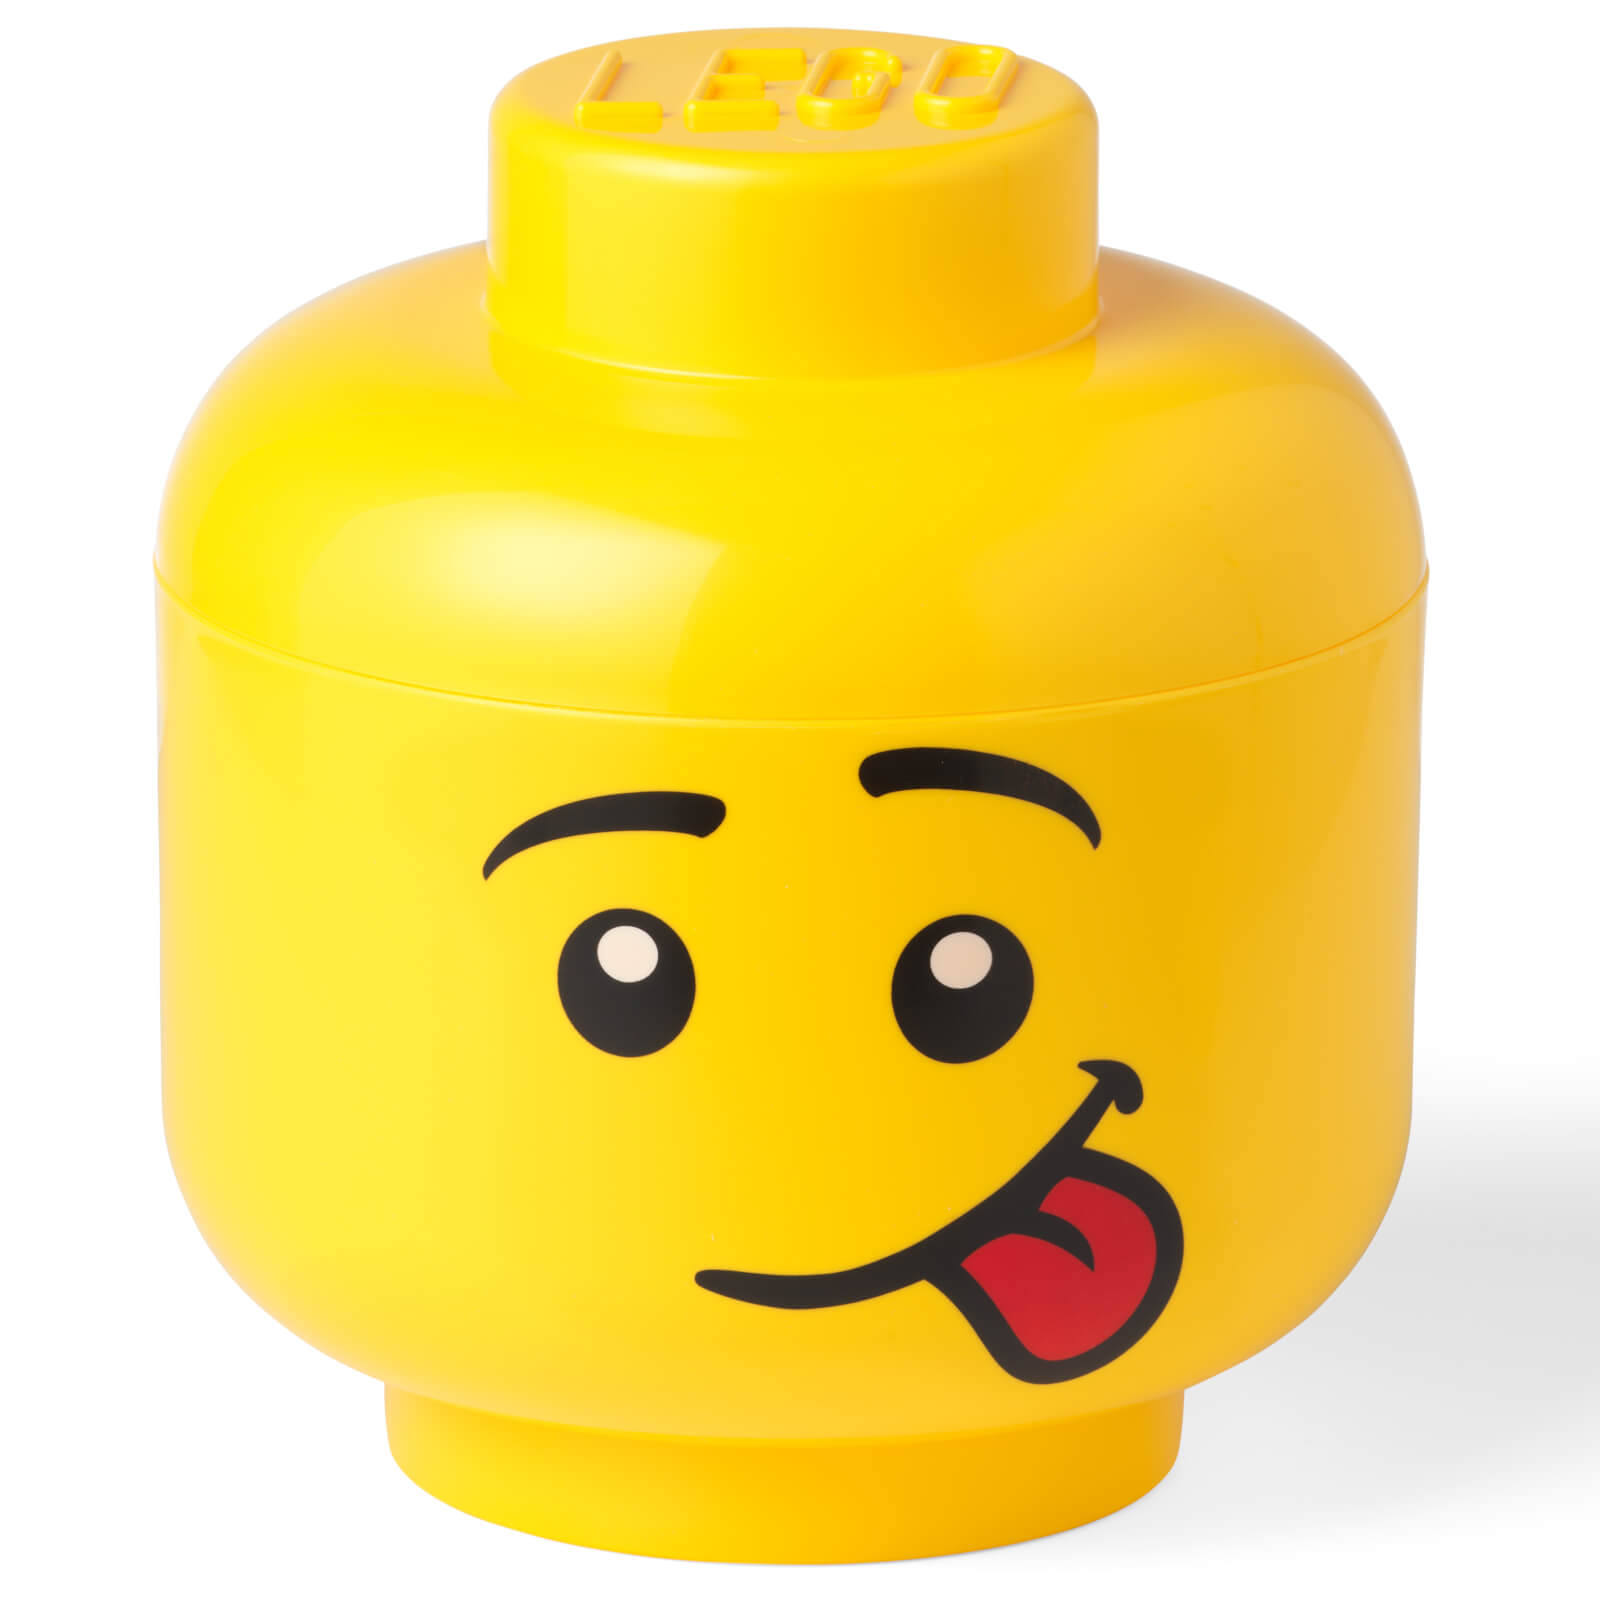 LEGO Storage Head Silly Large